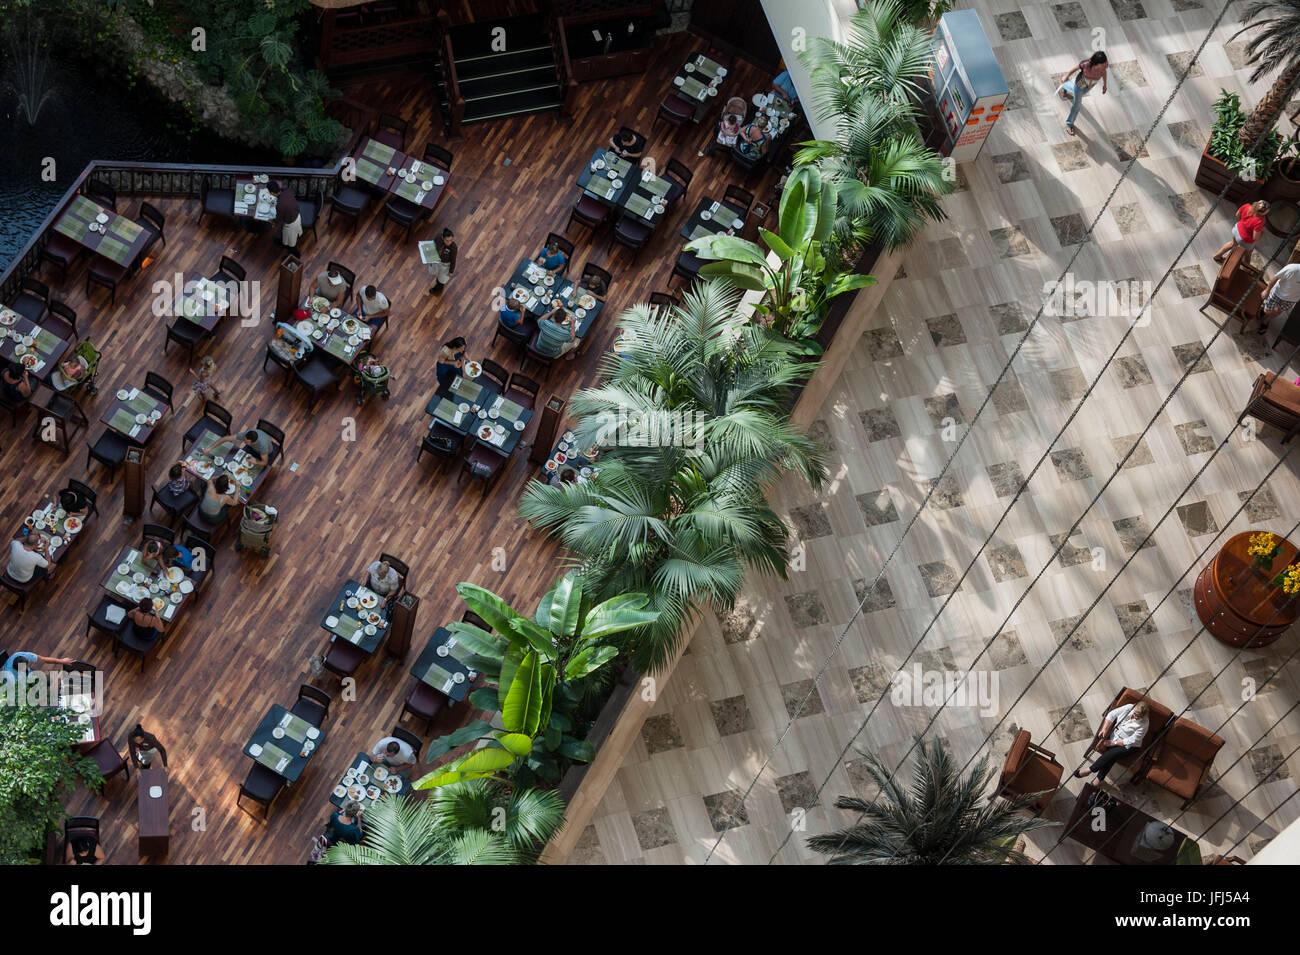 Arabia, Arabian peninsula, the Persian Gulf, United Arab Emirates (VAE), Schardscha / Sharjah, Radisson Blu Resort - Stock Image